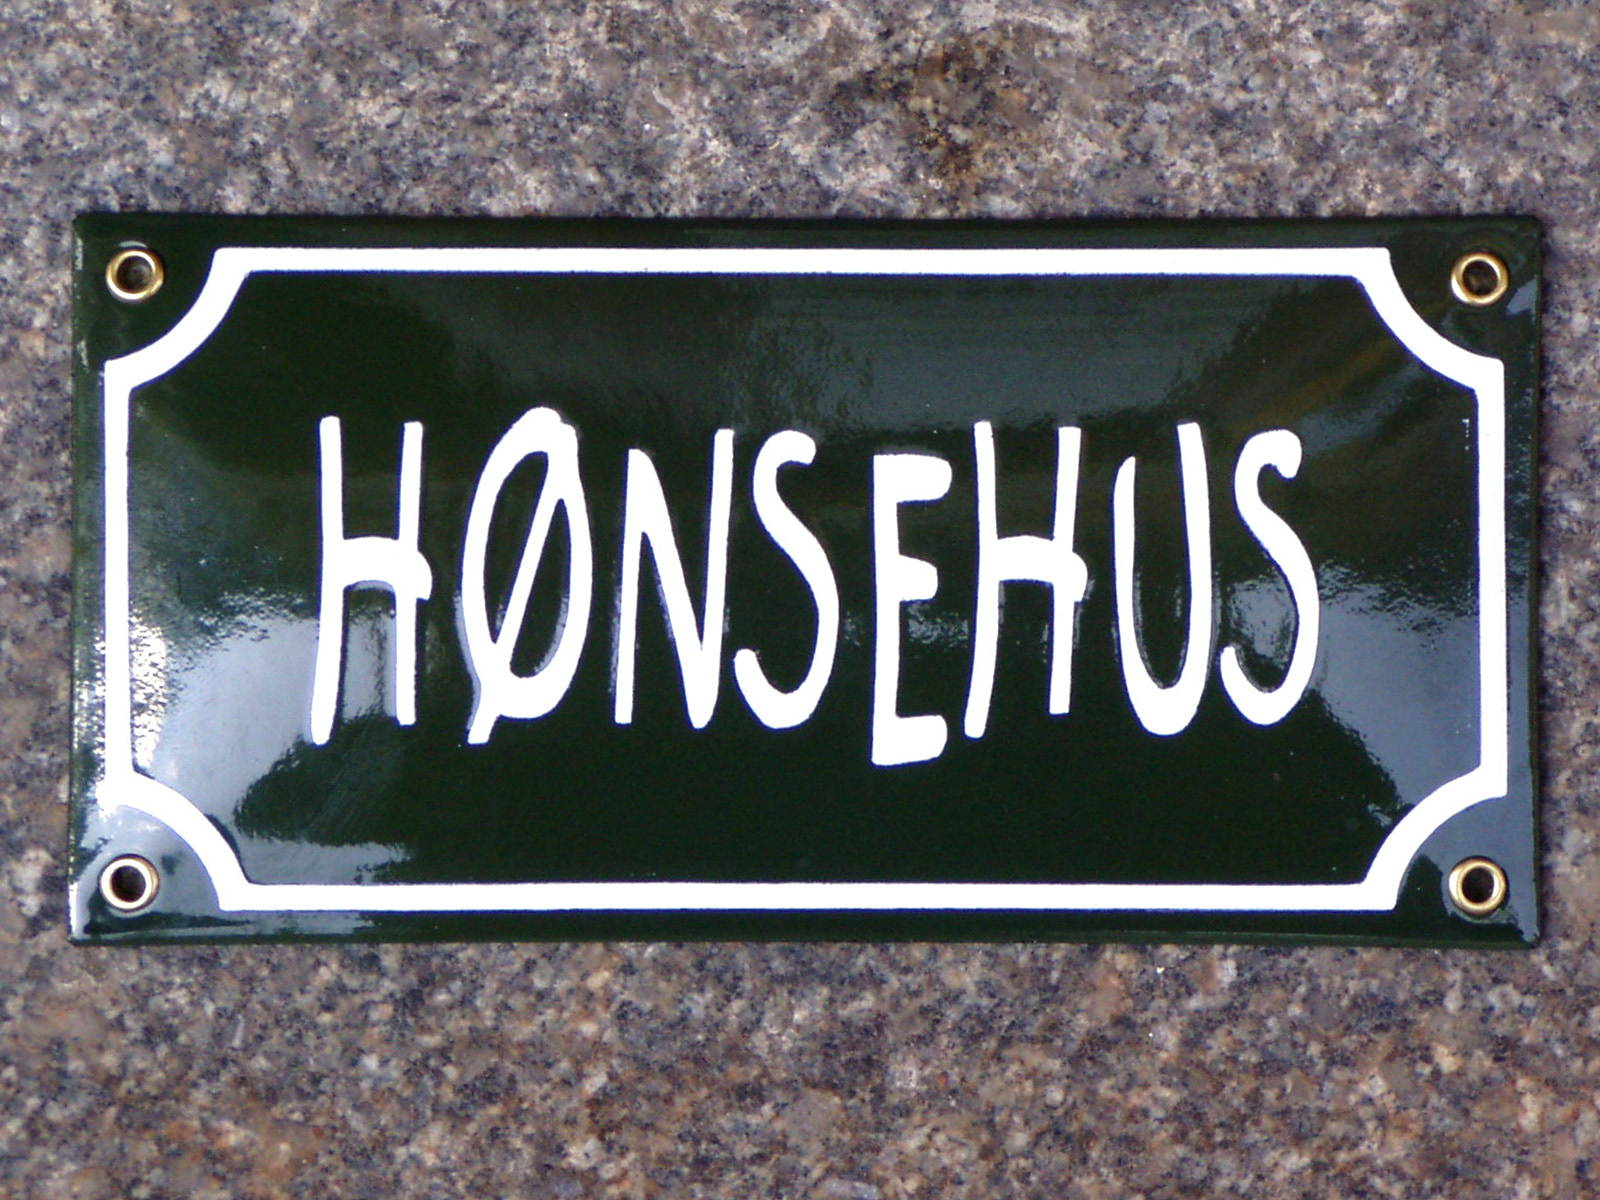 Husskilte-Hoensehus-web1600